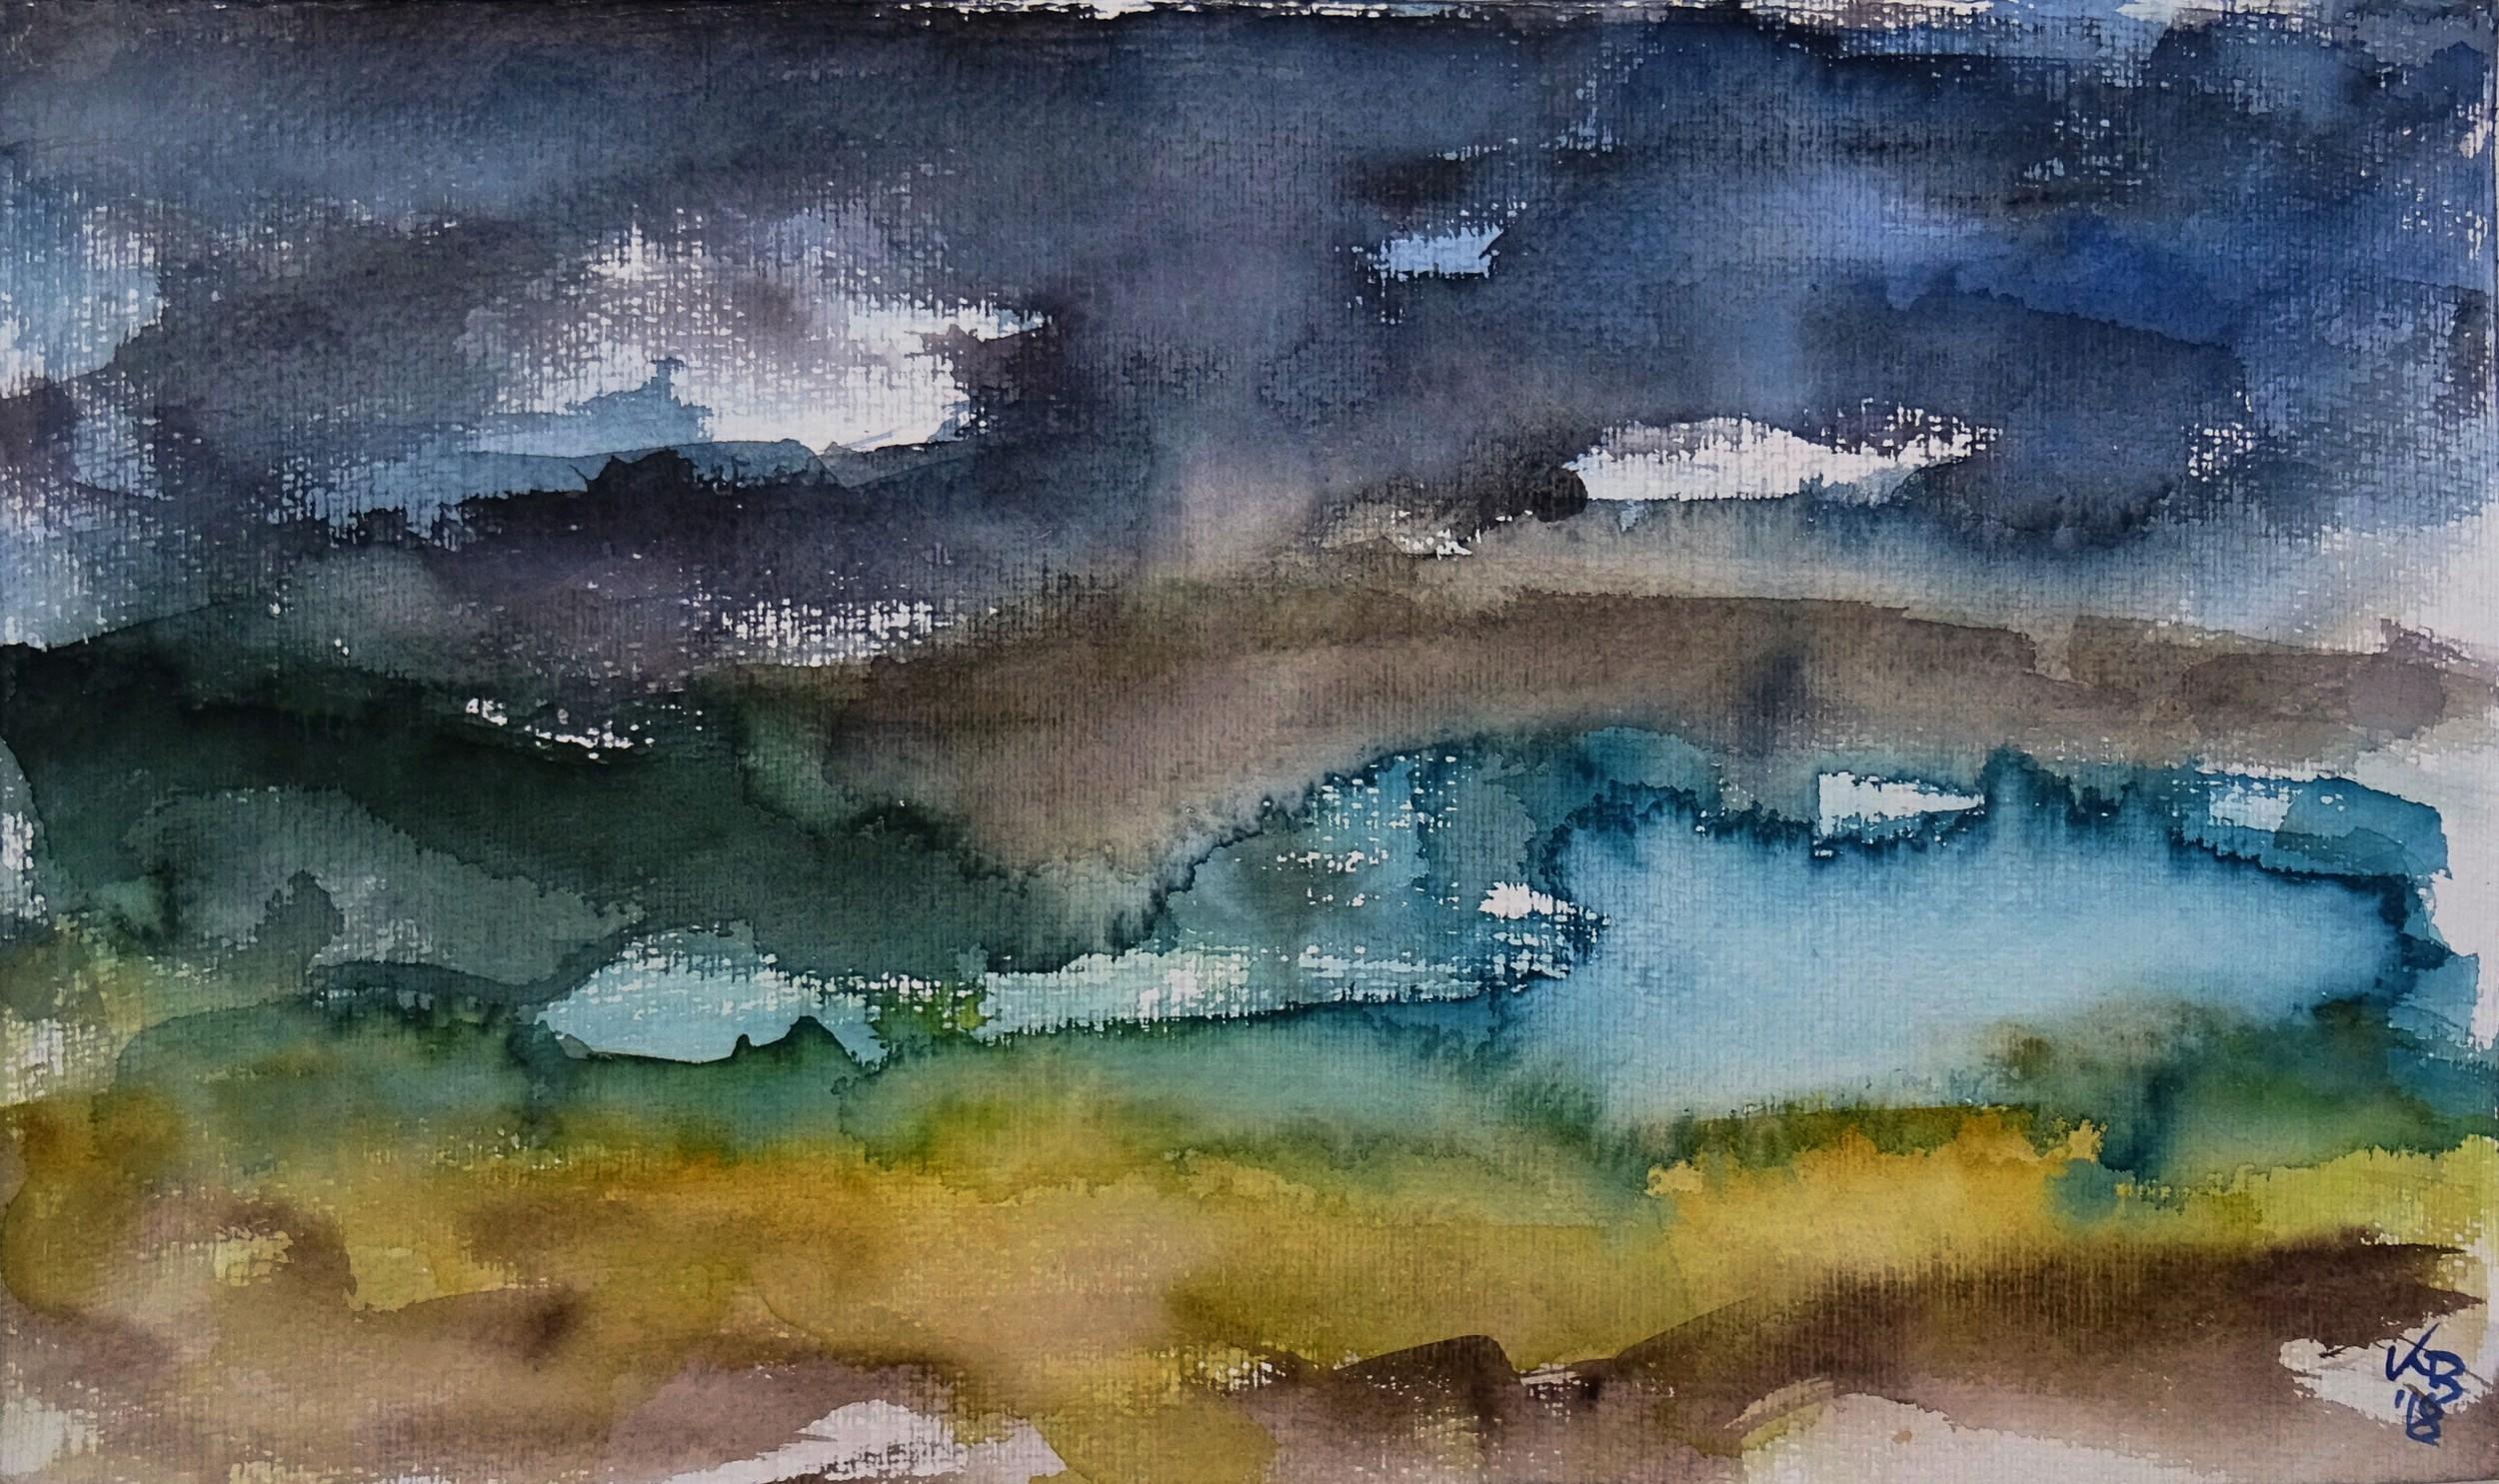 18-12-28_outer_hebrides_harris_horgabost_beach_Watercolour_50_x_30_cm_©2018_by_Klaus_Bölling.jpg